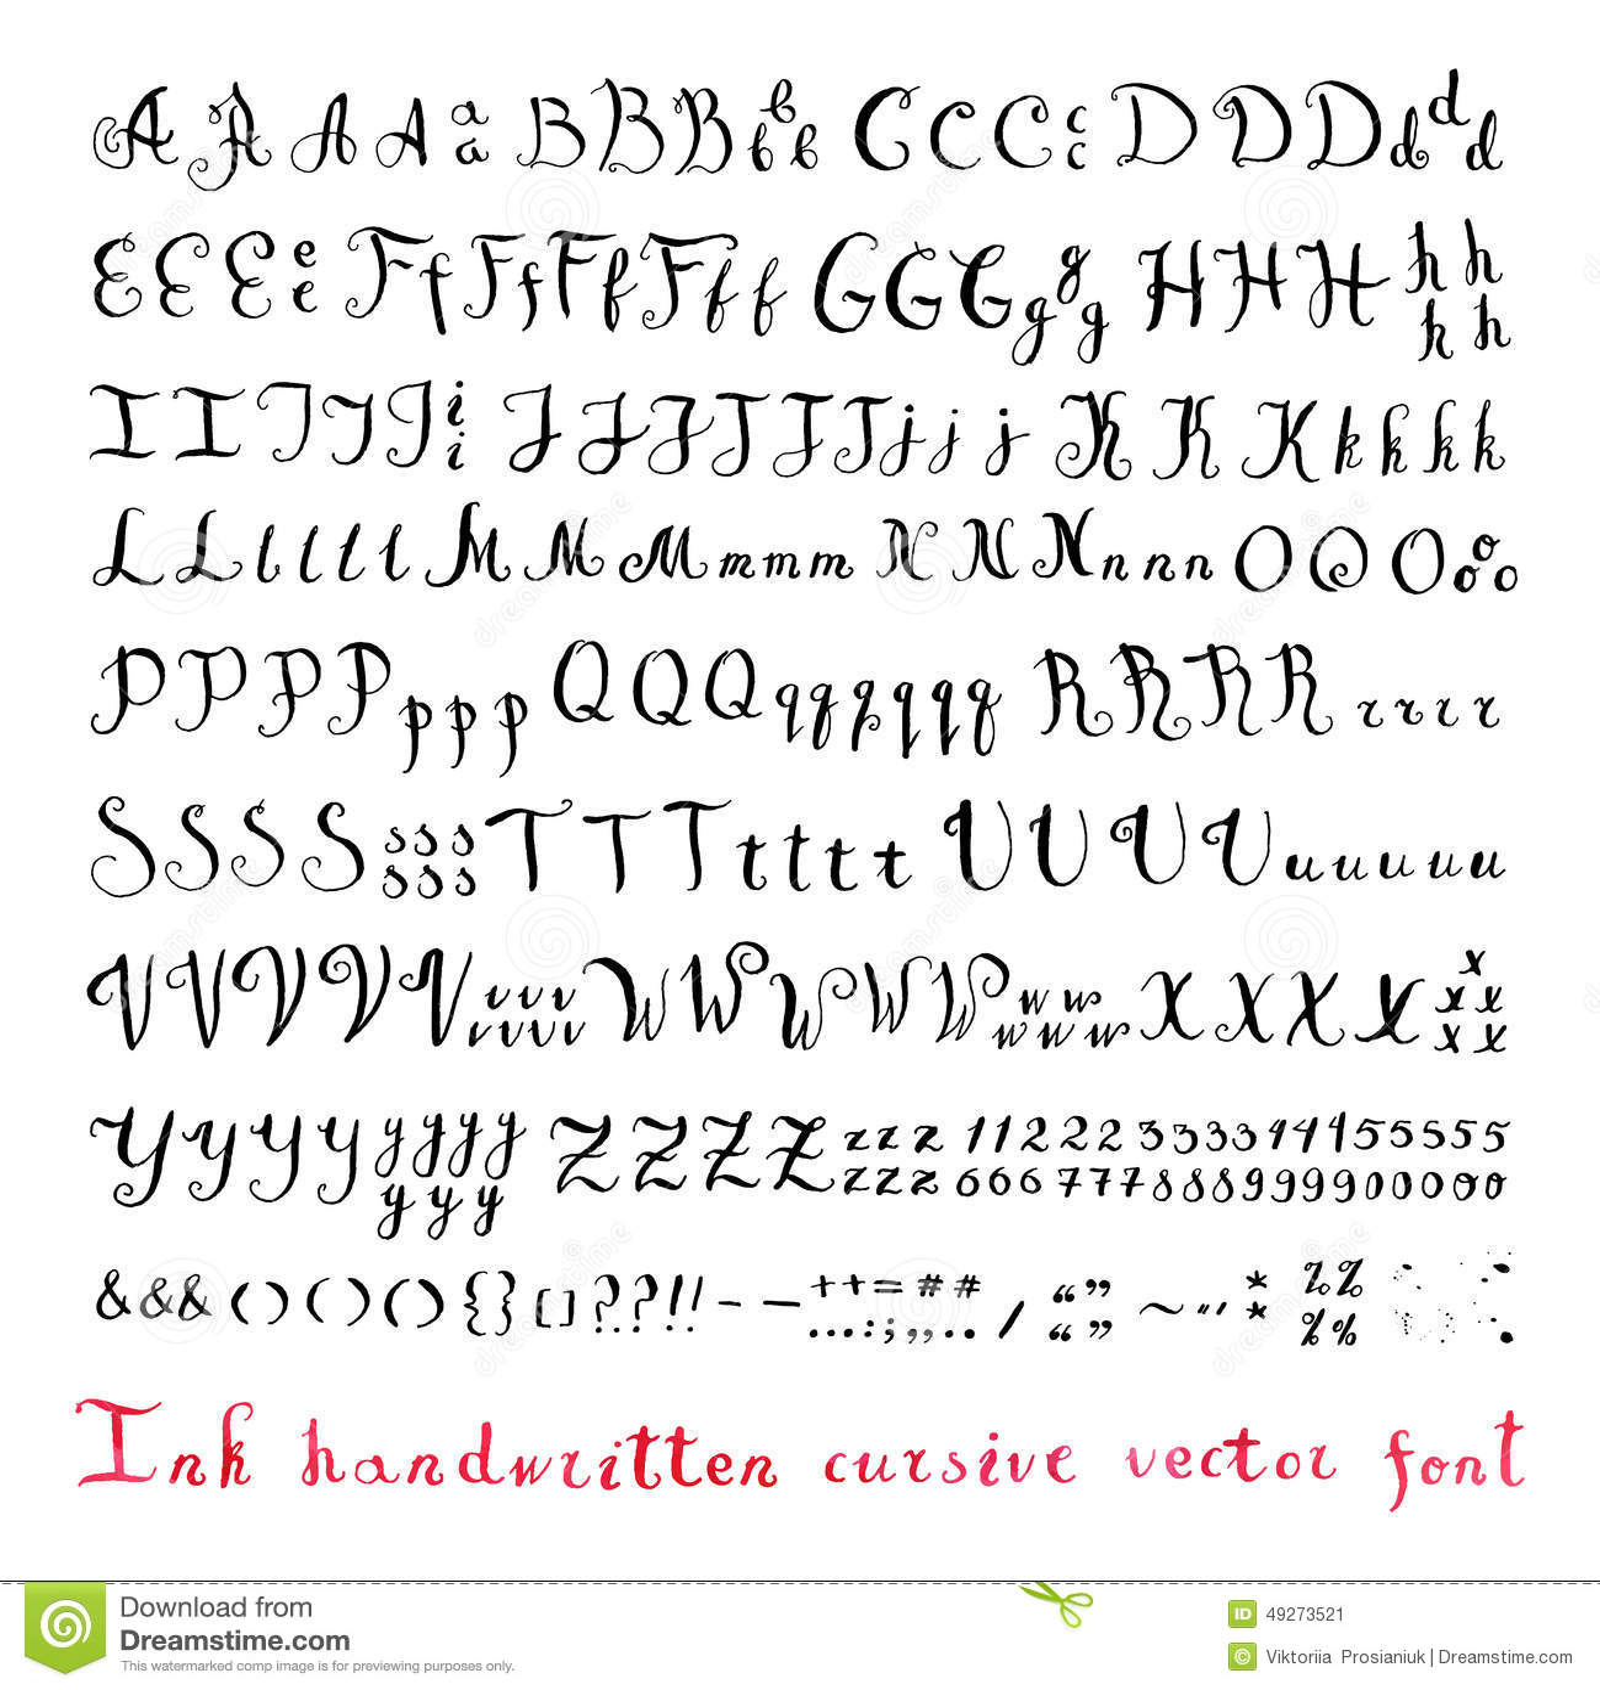 Handwritten Vintage Ink Cursive Vector Alphabet Font